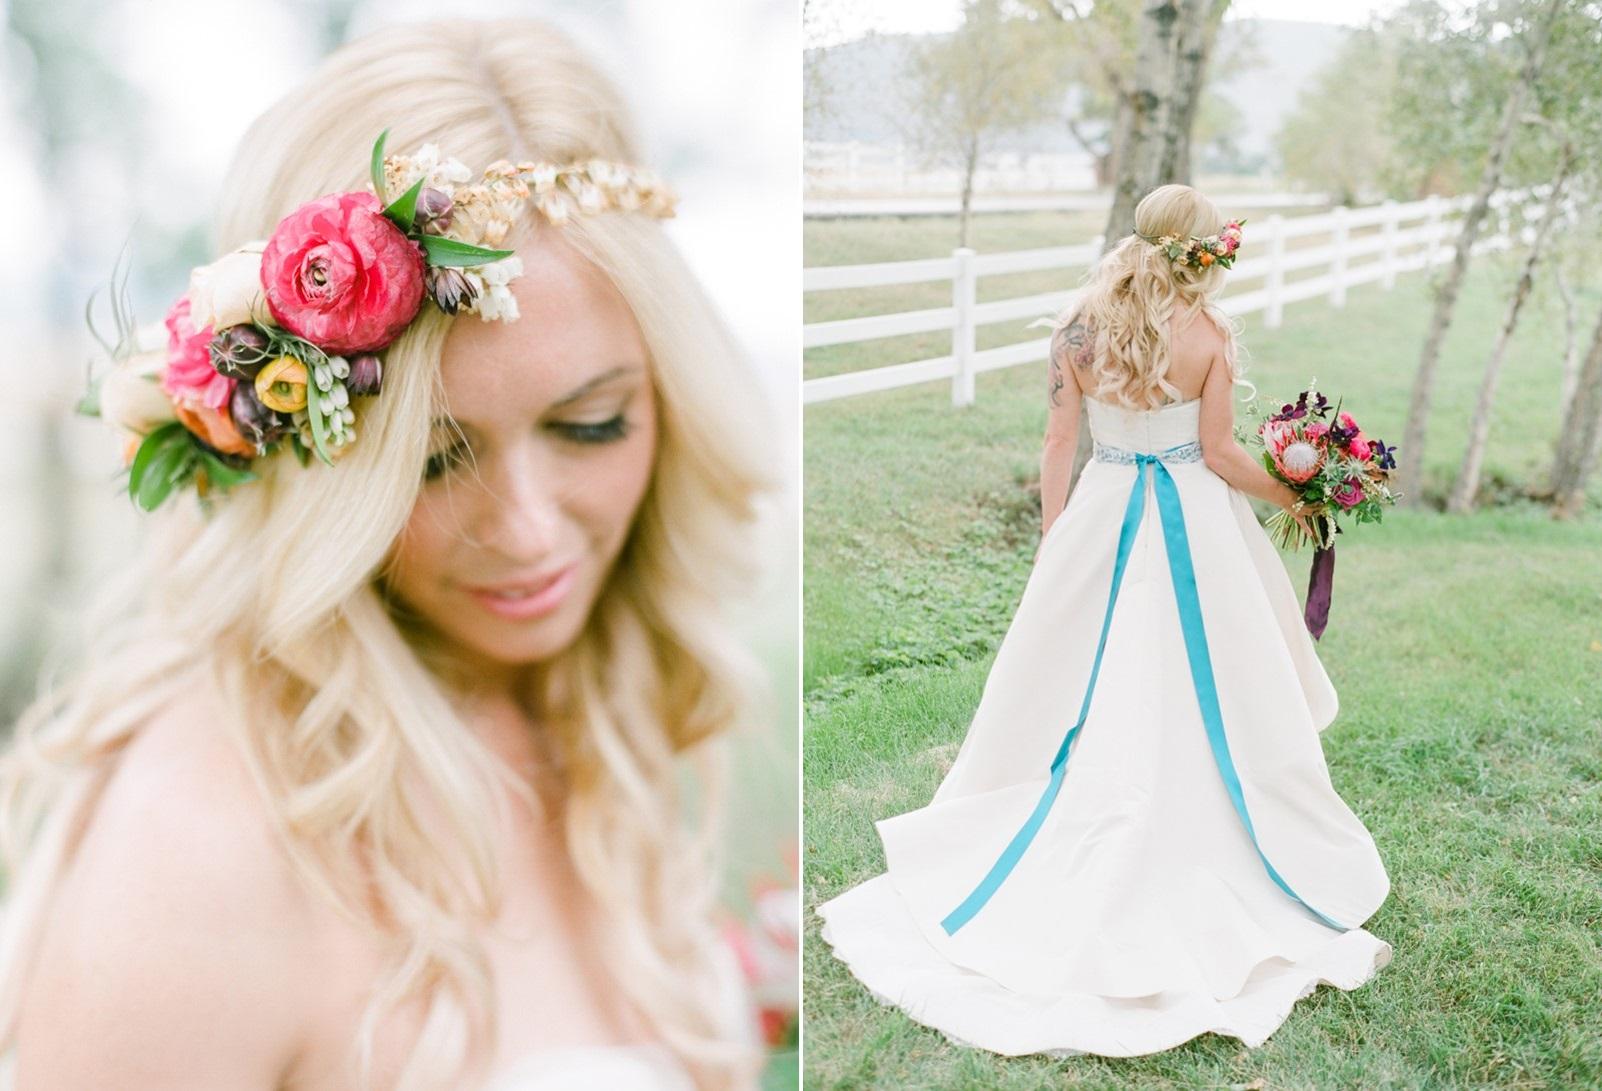 Boho Vintage Bride with Floral Crown